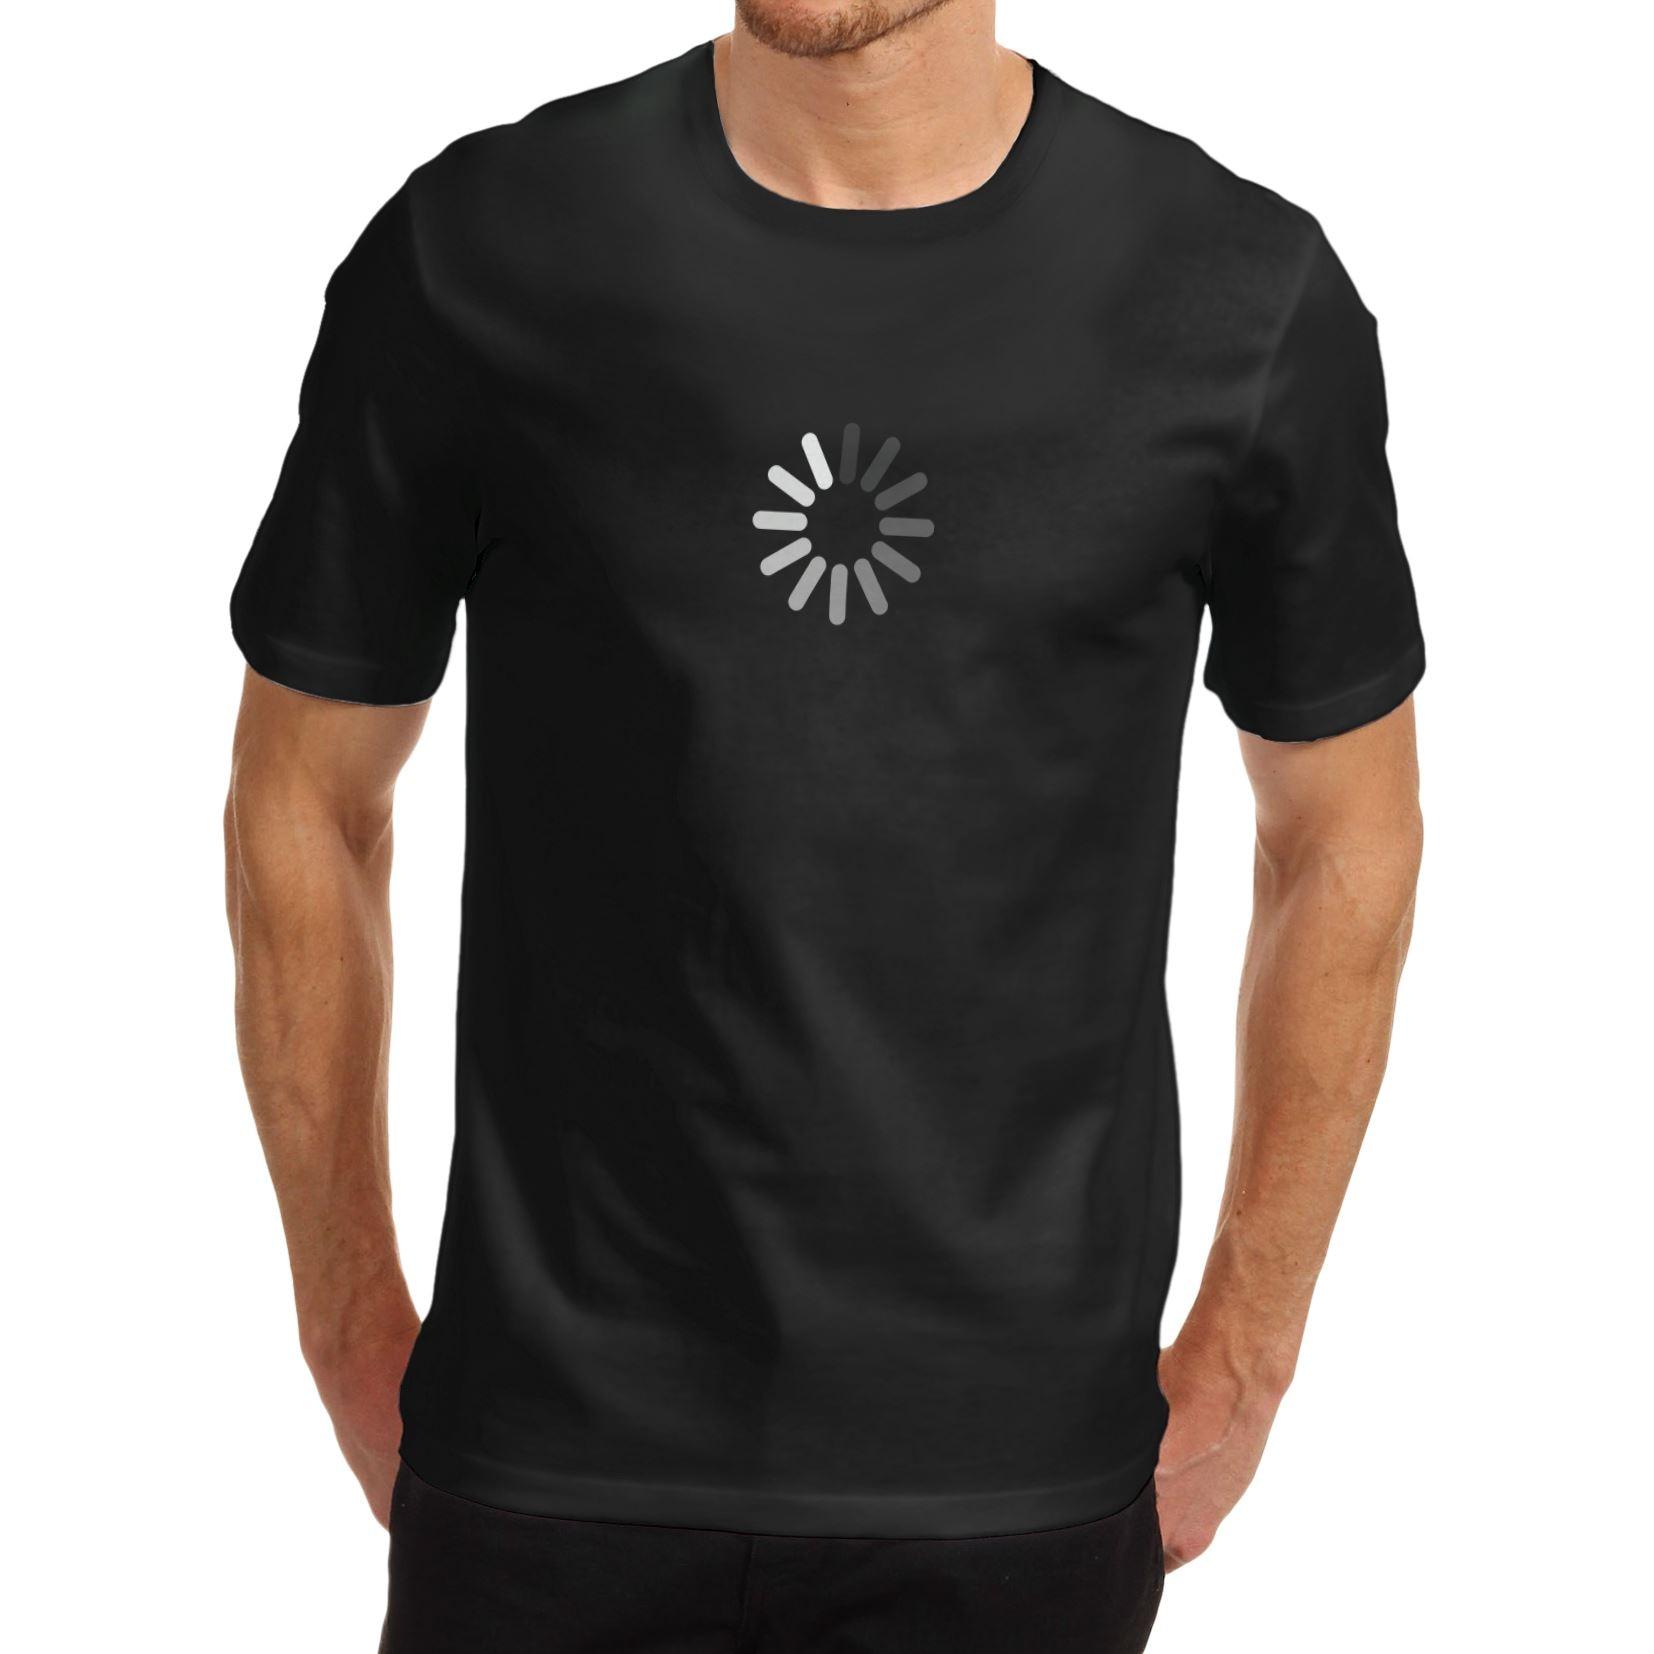 Shirt design price - Men T Shirt Lowest Price 100 Cotton Men Cotton Novelty Funny Design Wait Buffing Loading